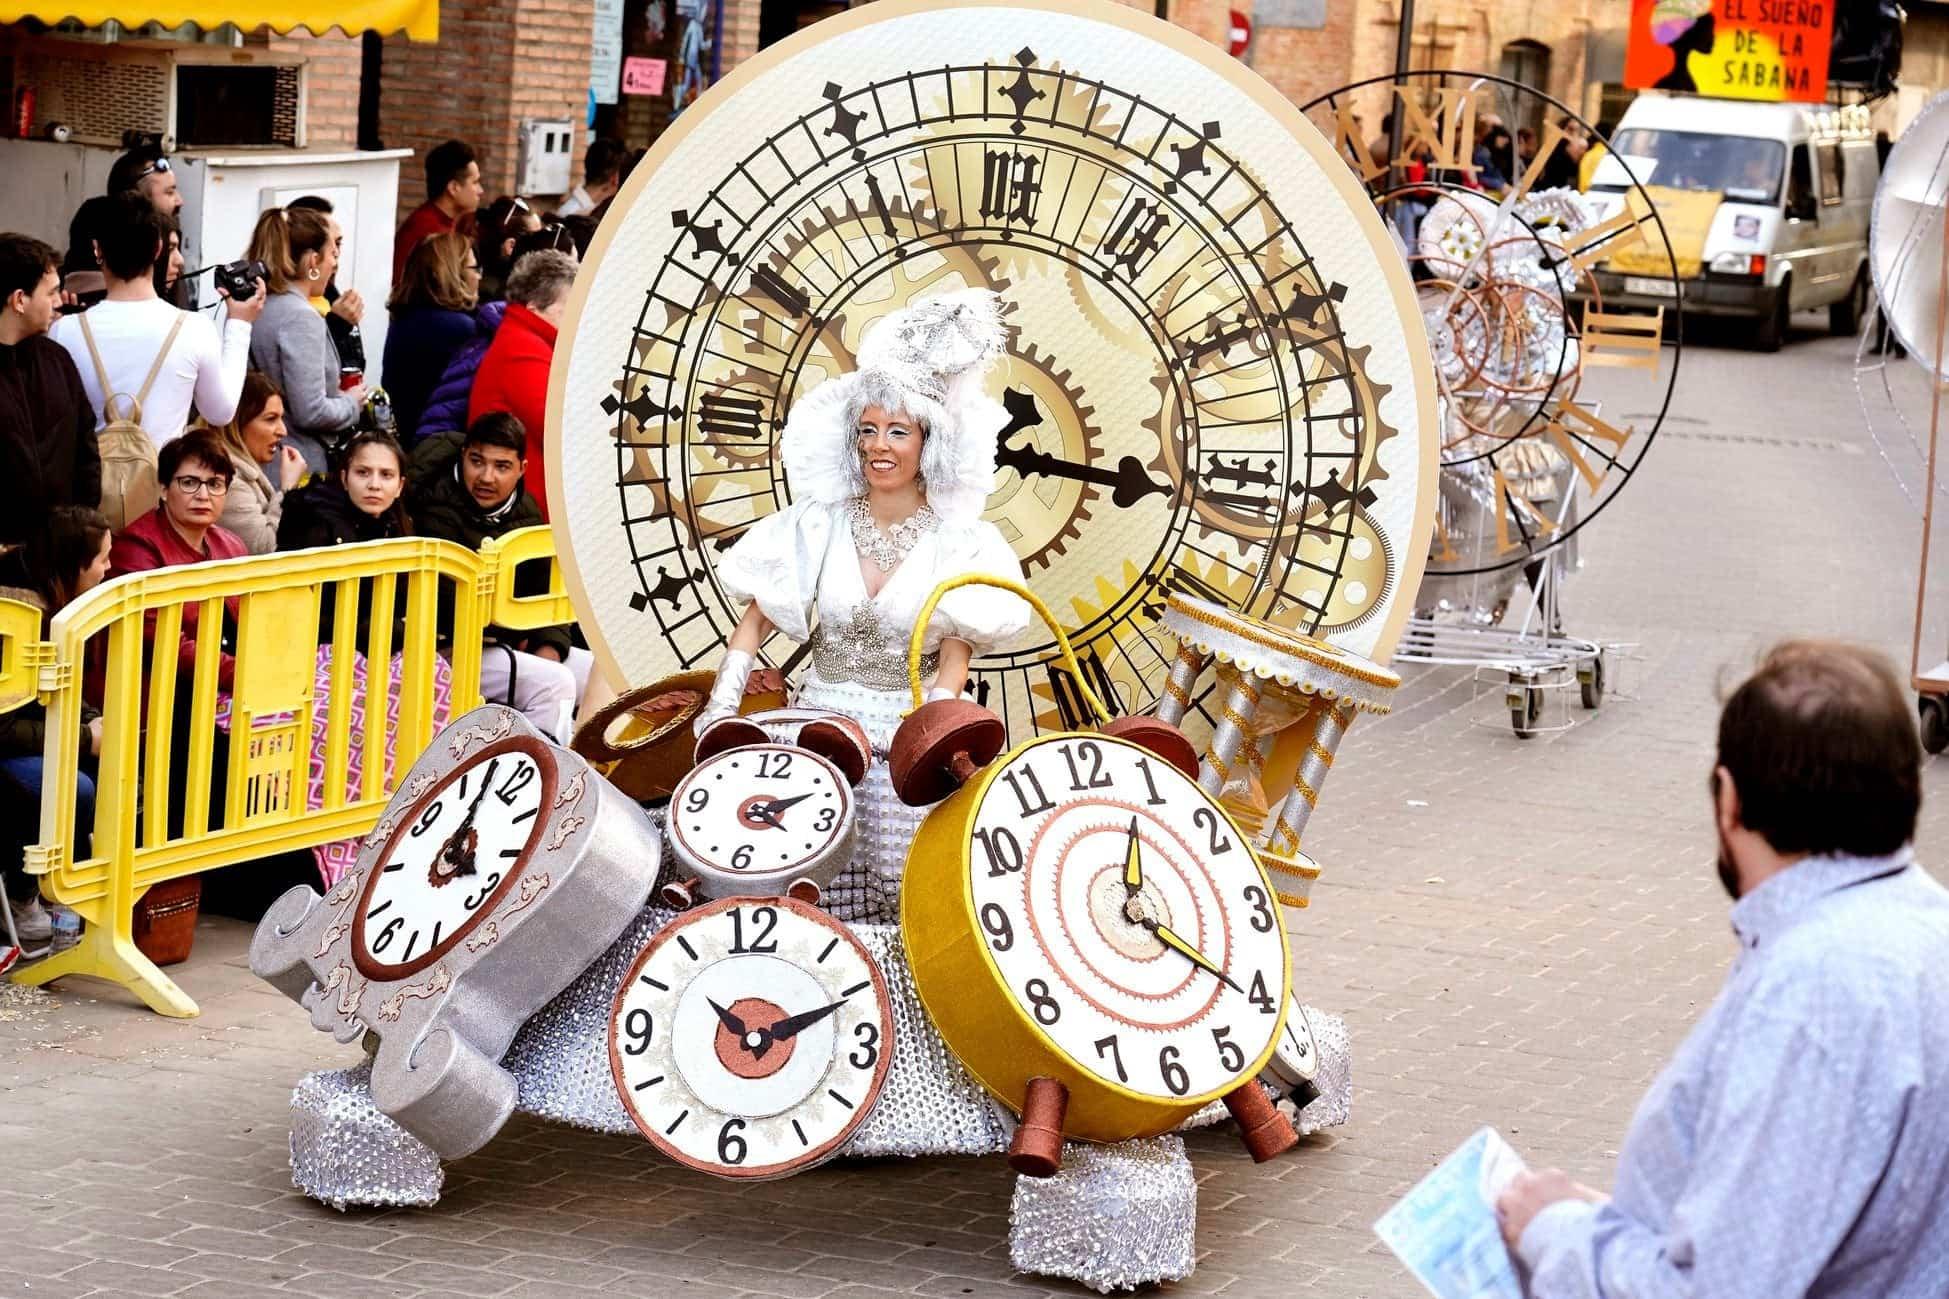 Carnaval de herencia 2020 ofertorio 10 - Selección de fotografías del Ofertorio del Carnaval de Herencia